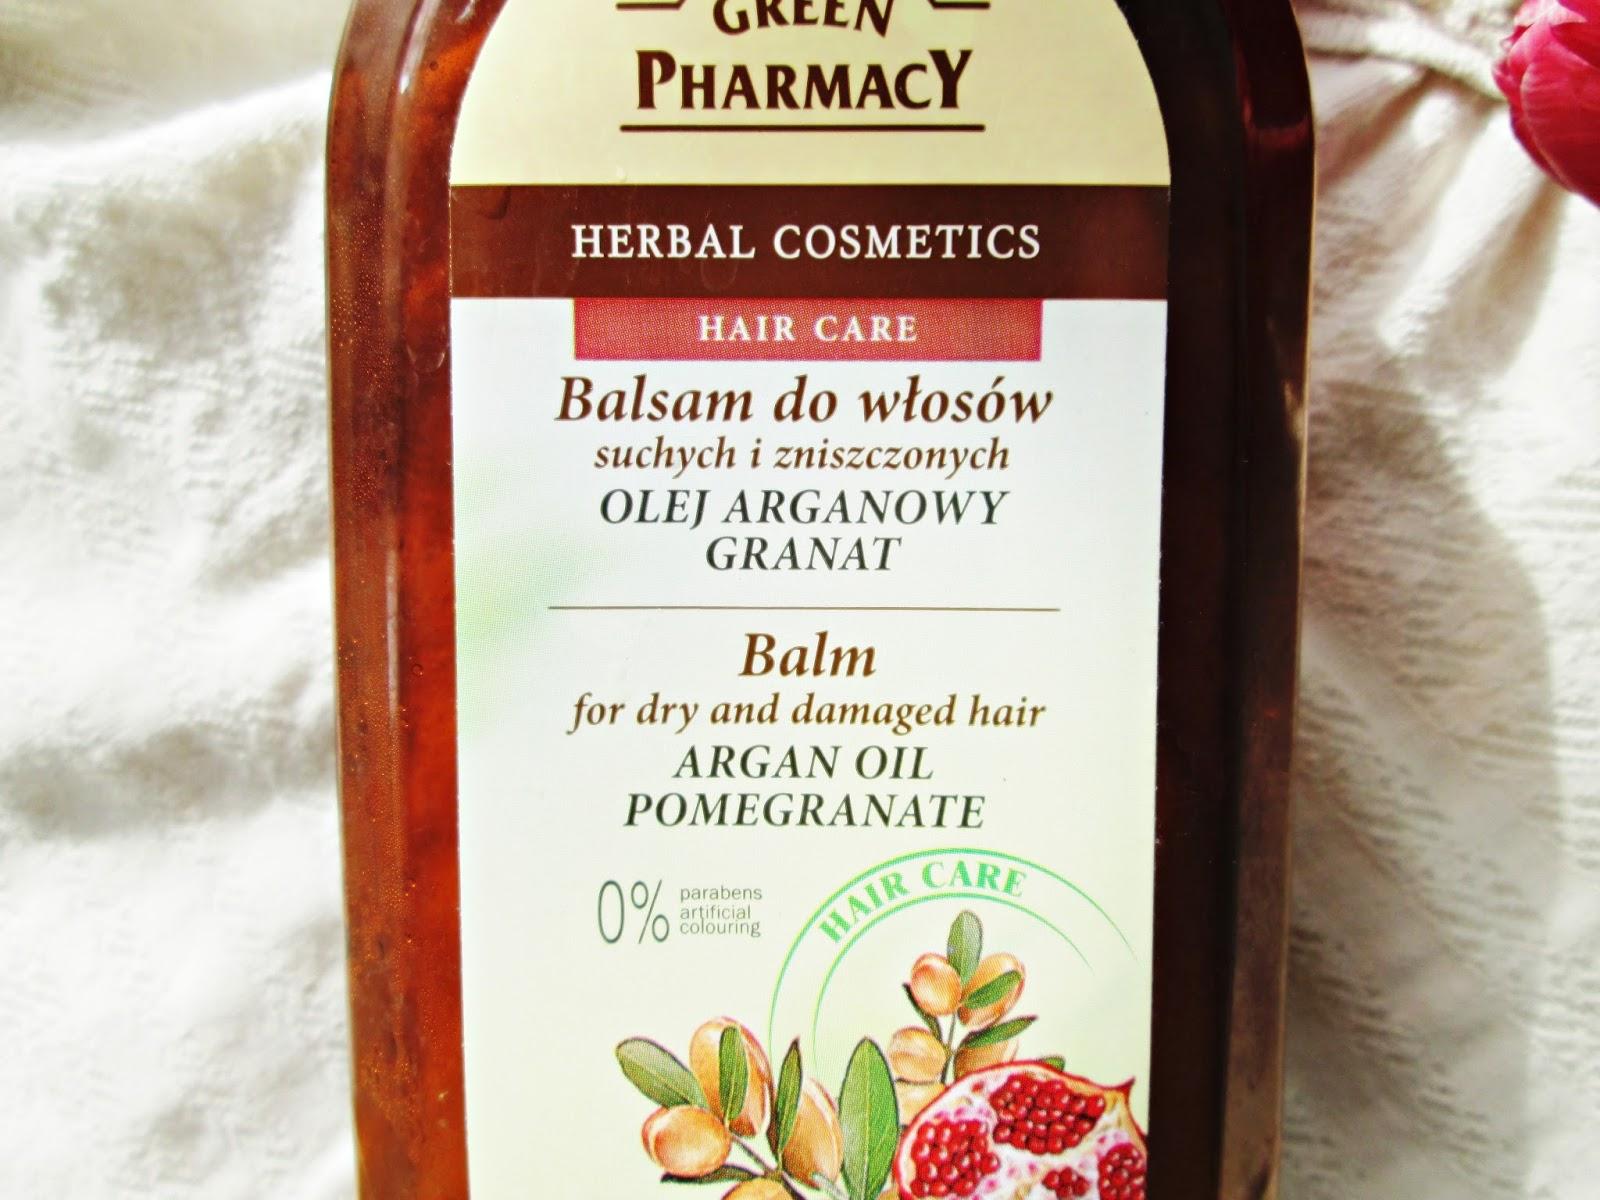 Green Pharmacy Balsam z olejem arganowym i granatem